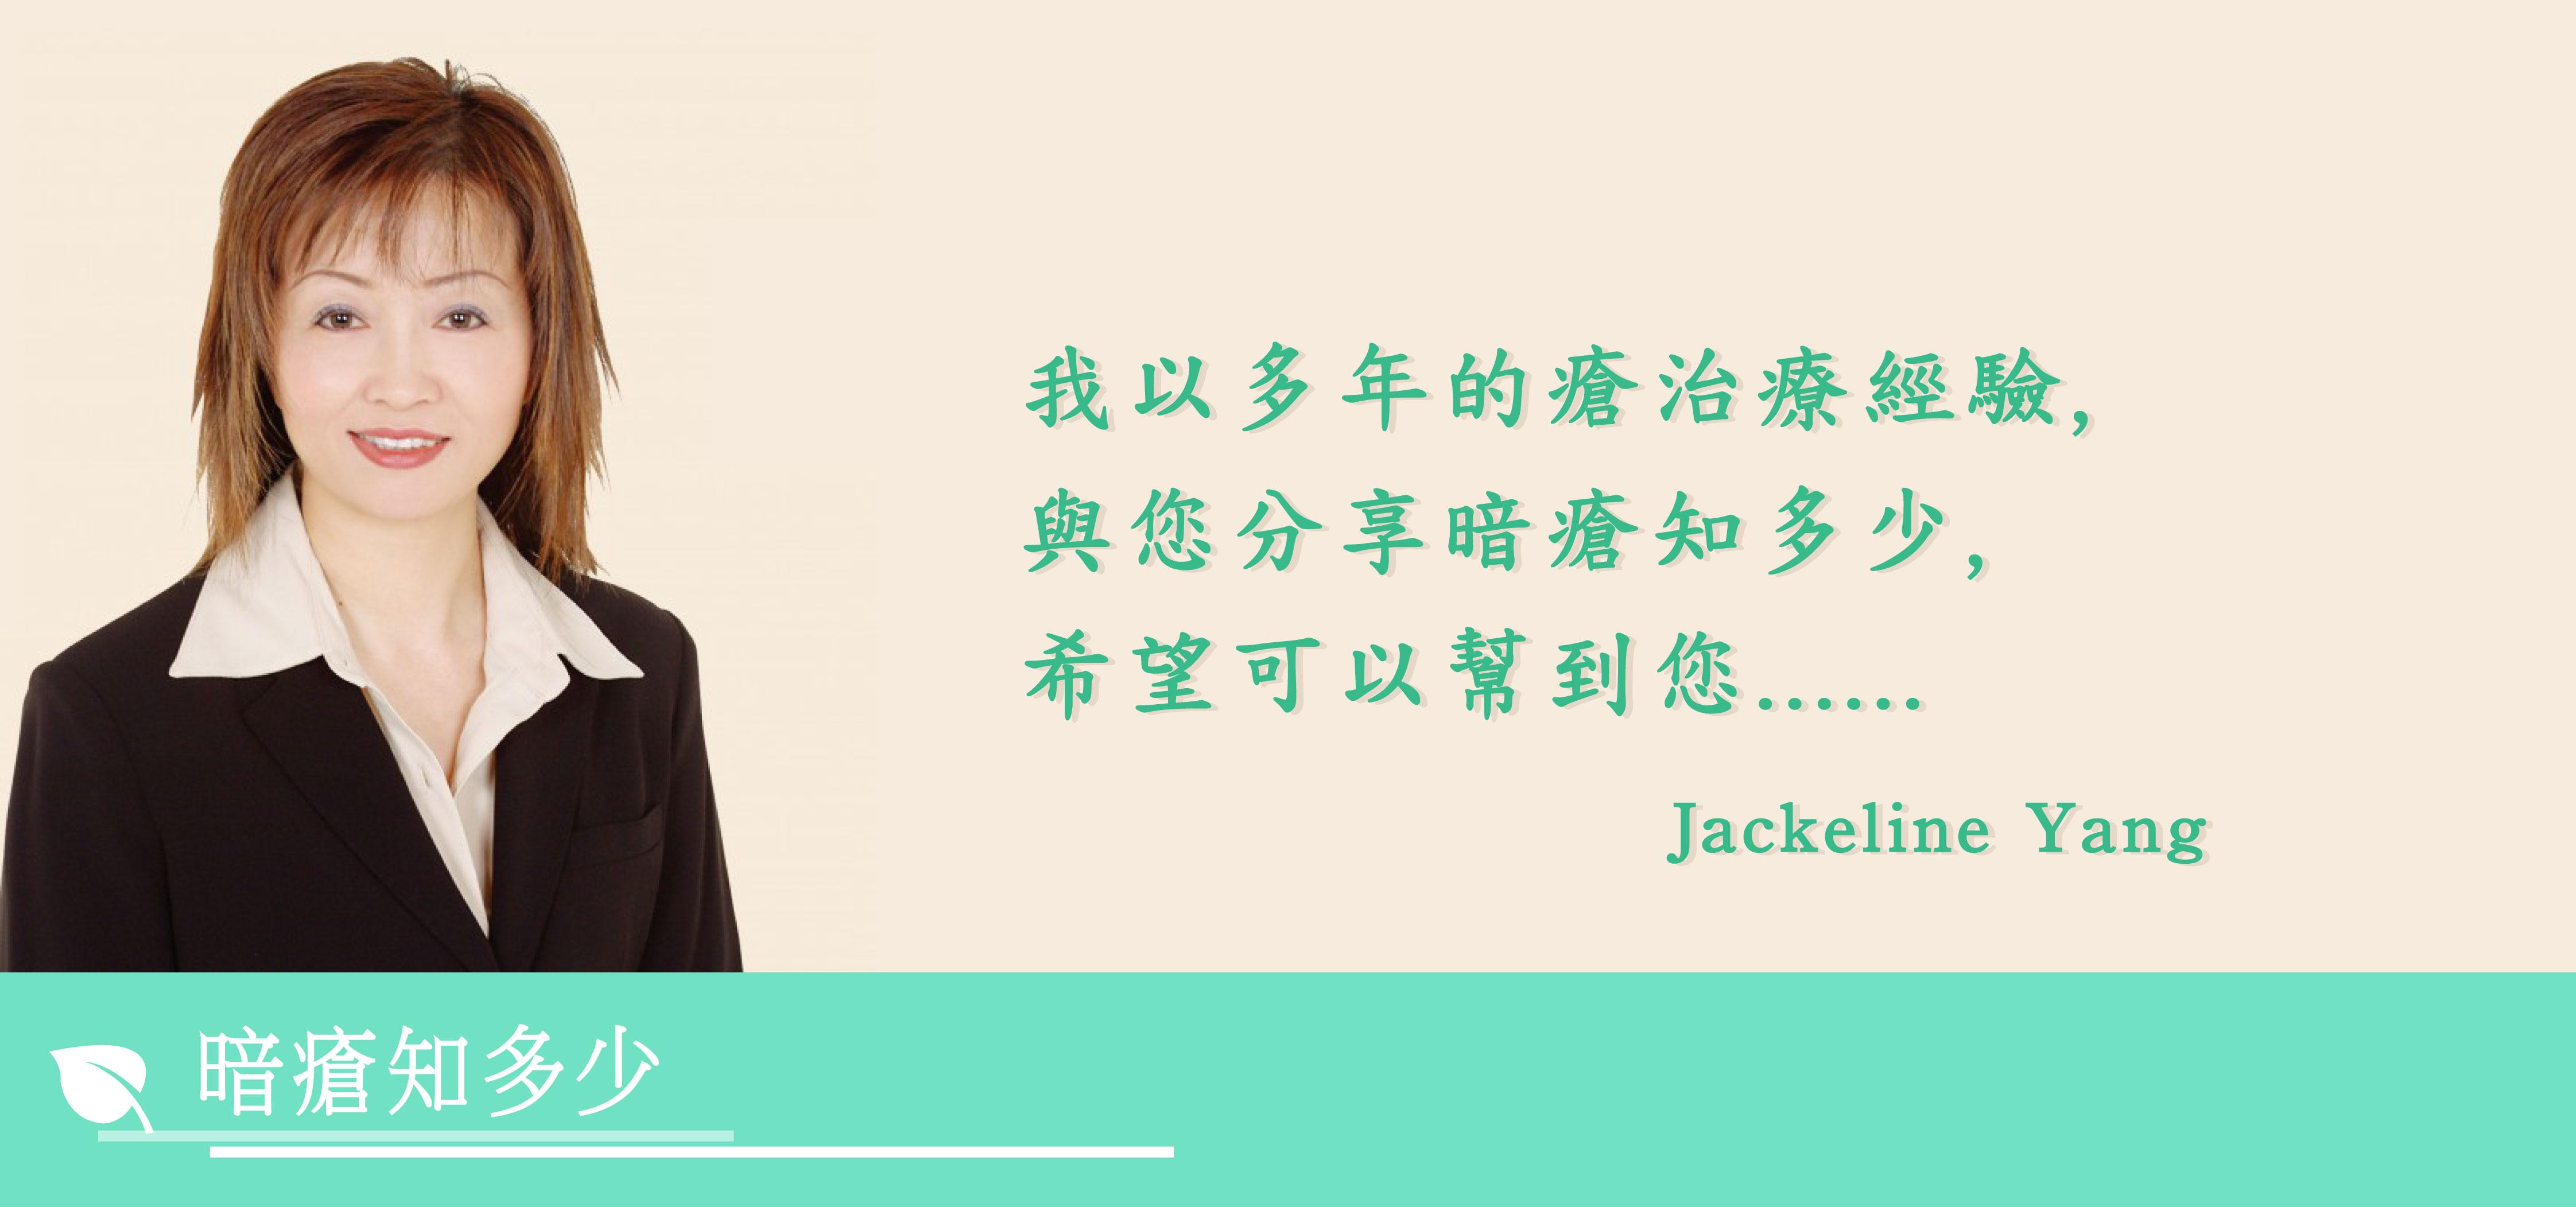 jb04-01